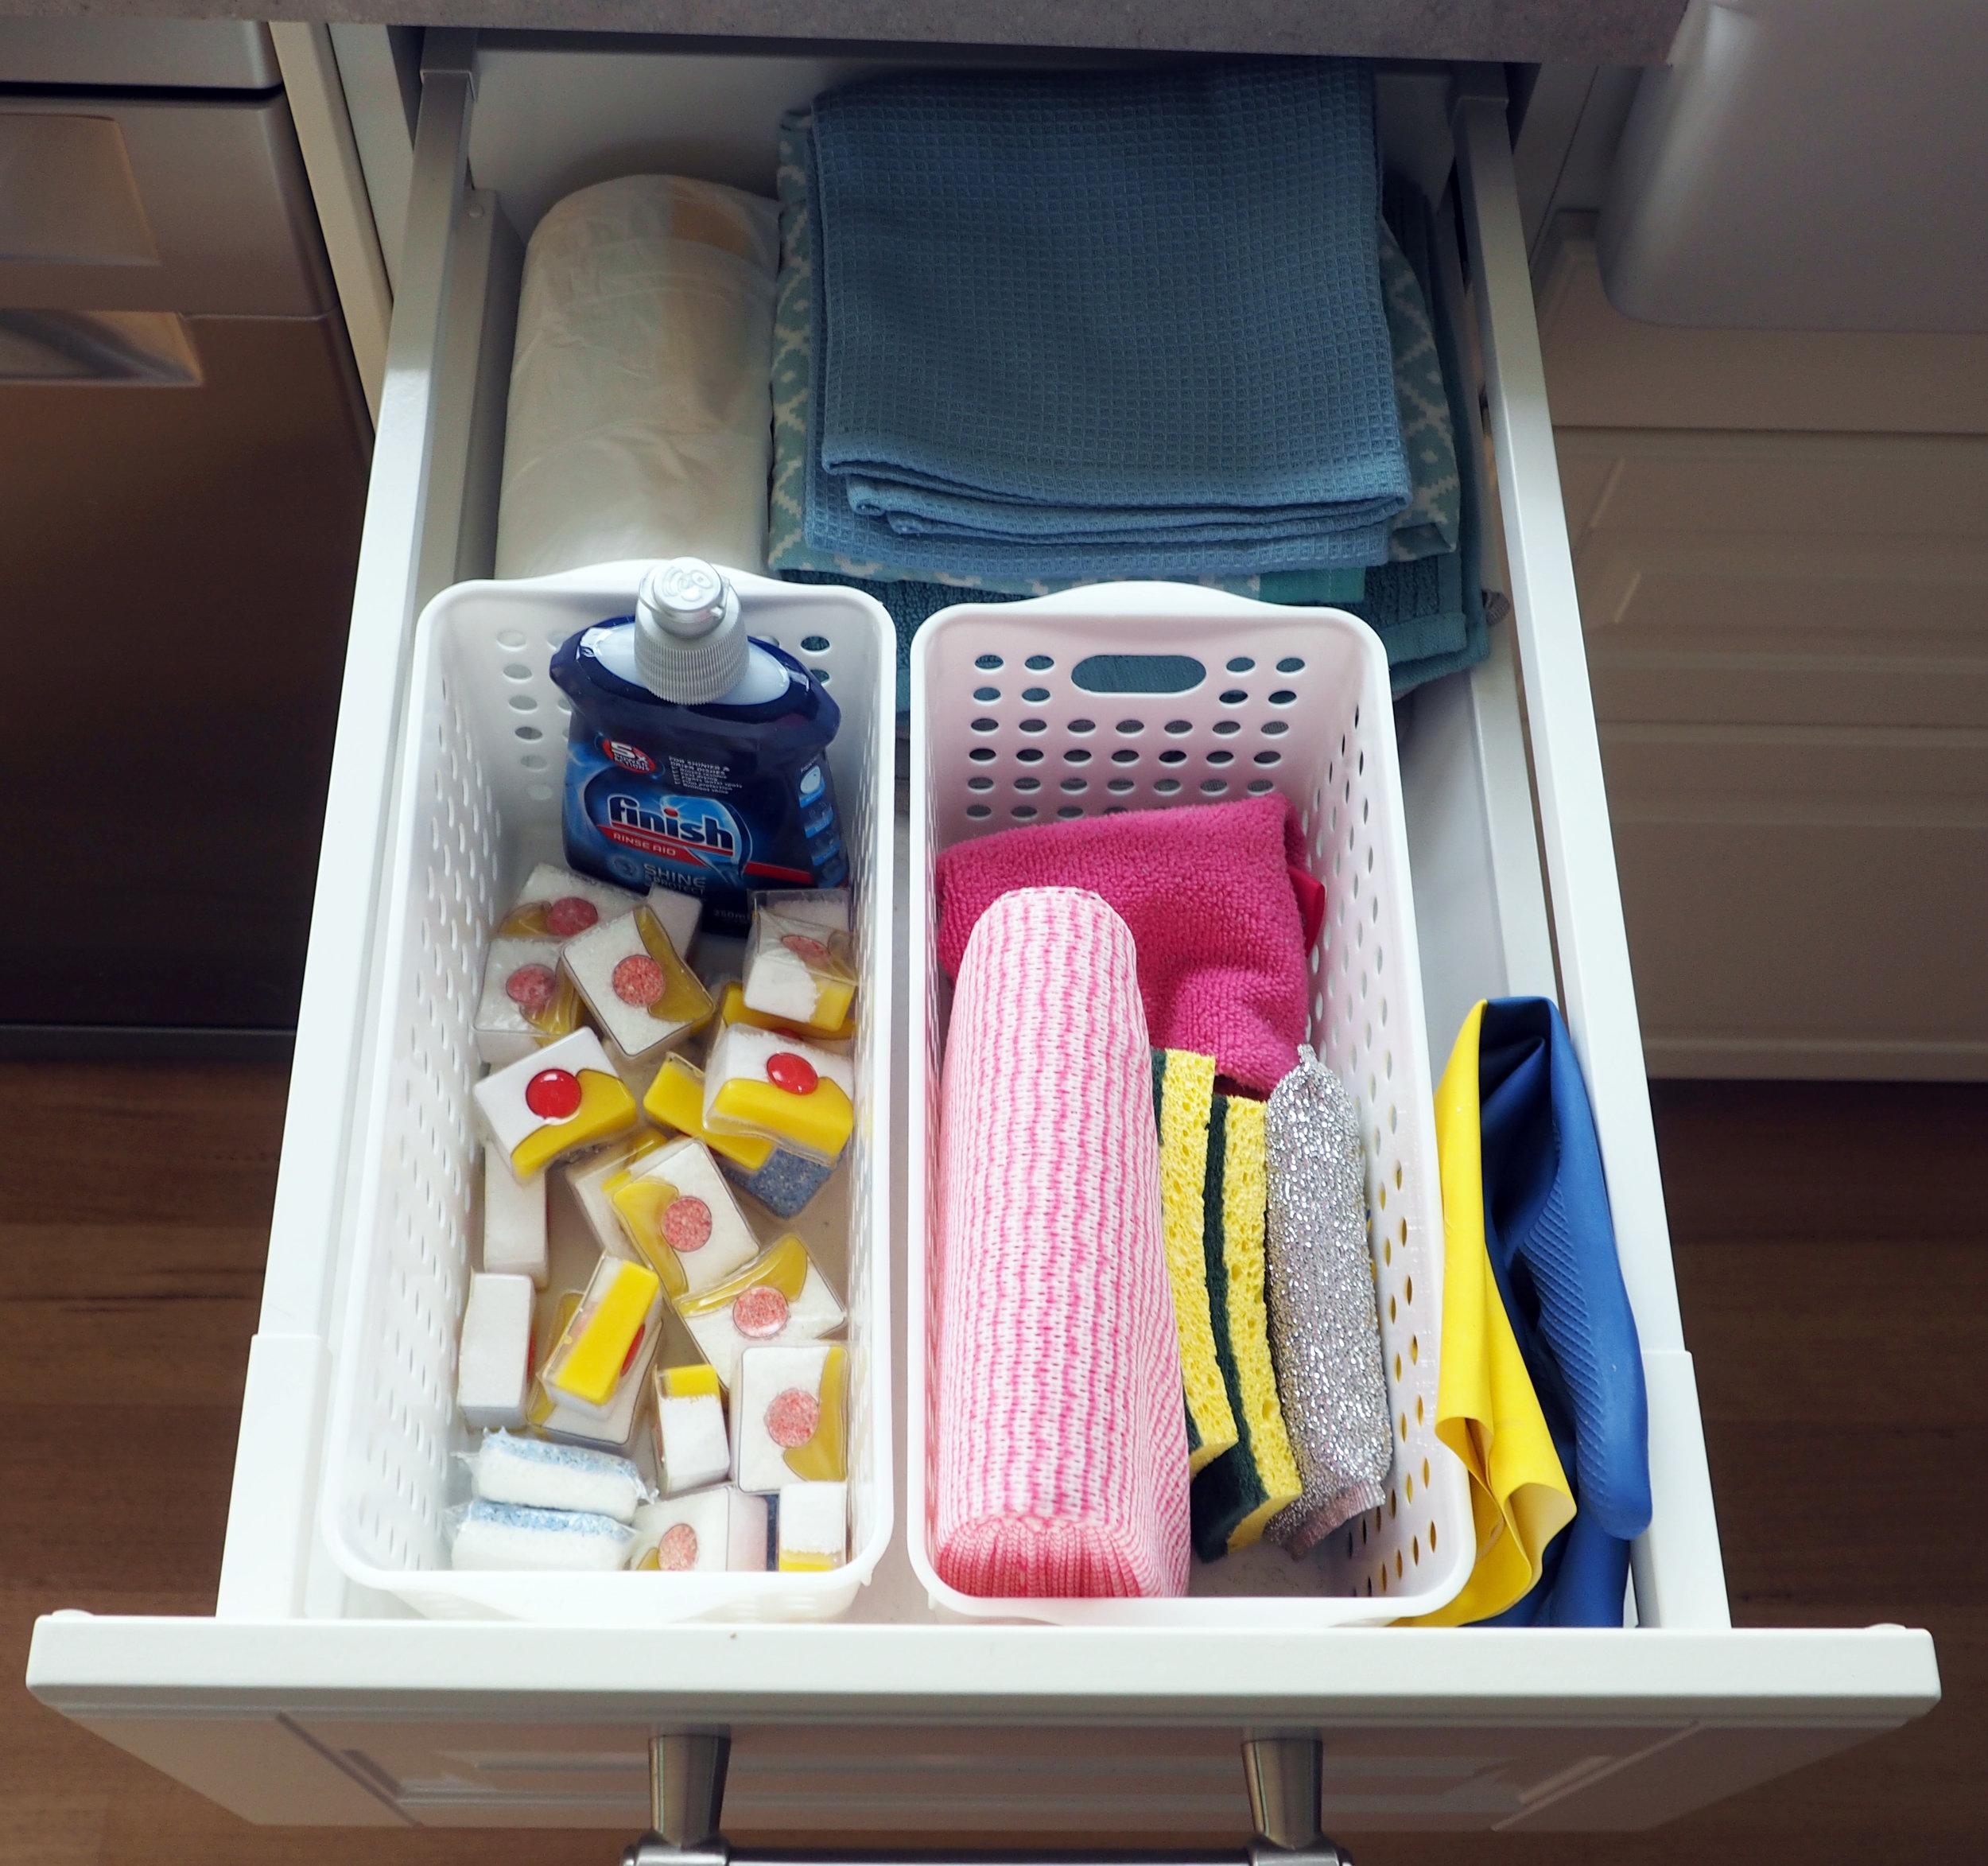 Cheap baskets make a great kitchen storage solution